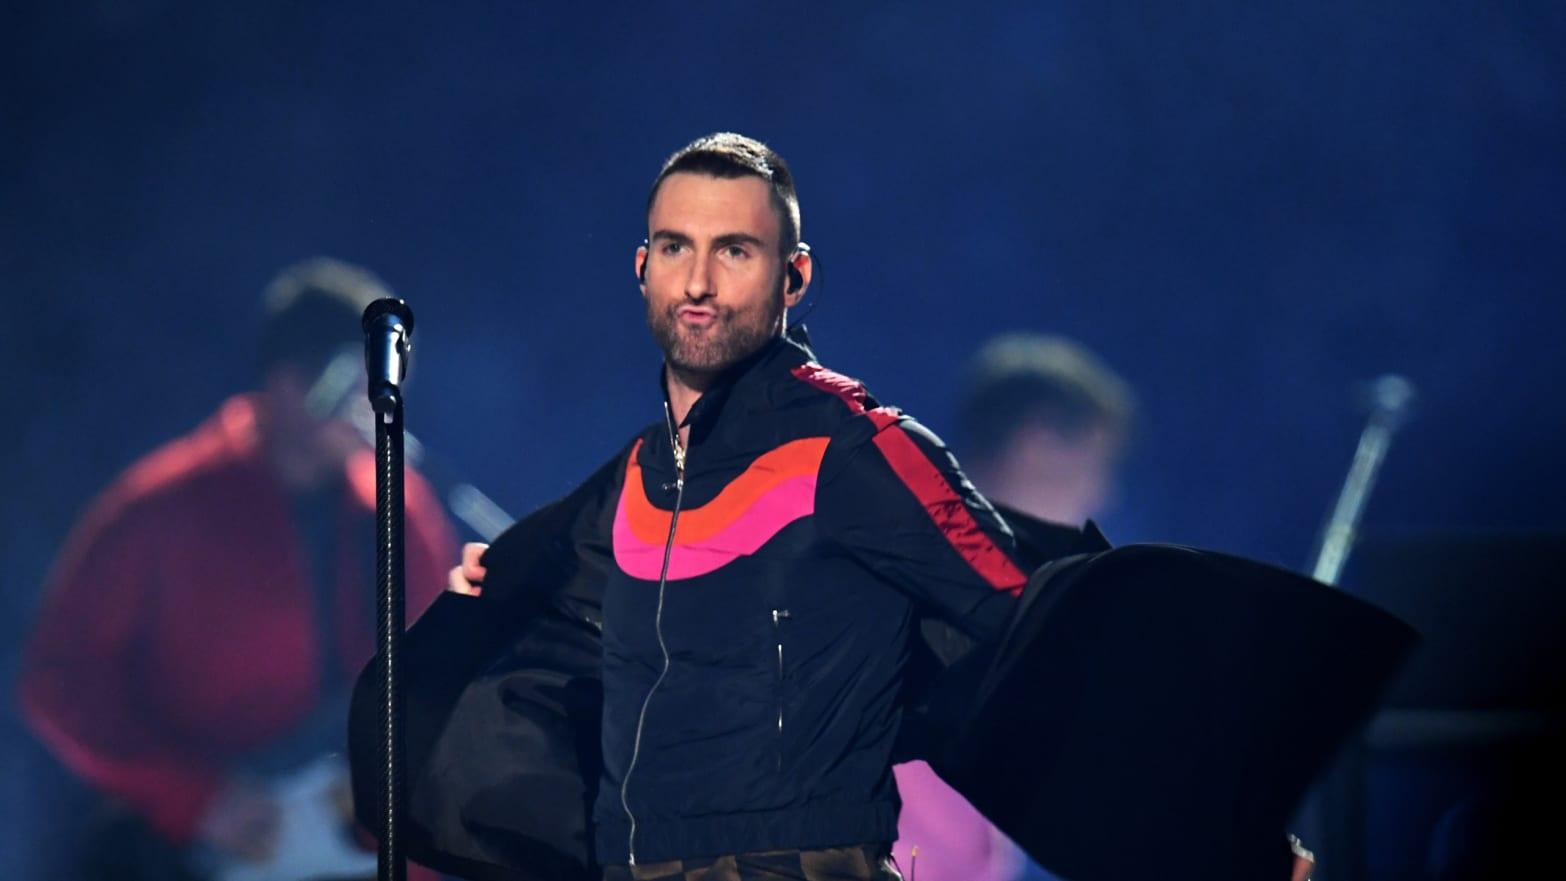 181c0fbc5 2019 Super Bowl's Halftime Show: Maroon 5, Adam Levine Dragged on Twitter